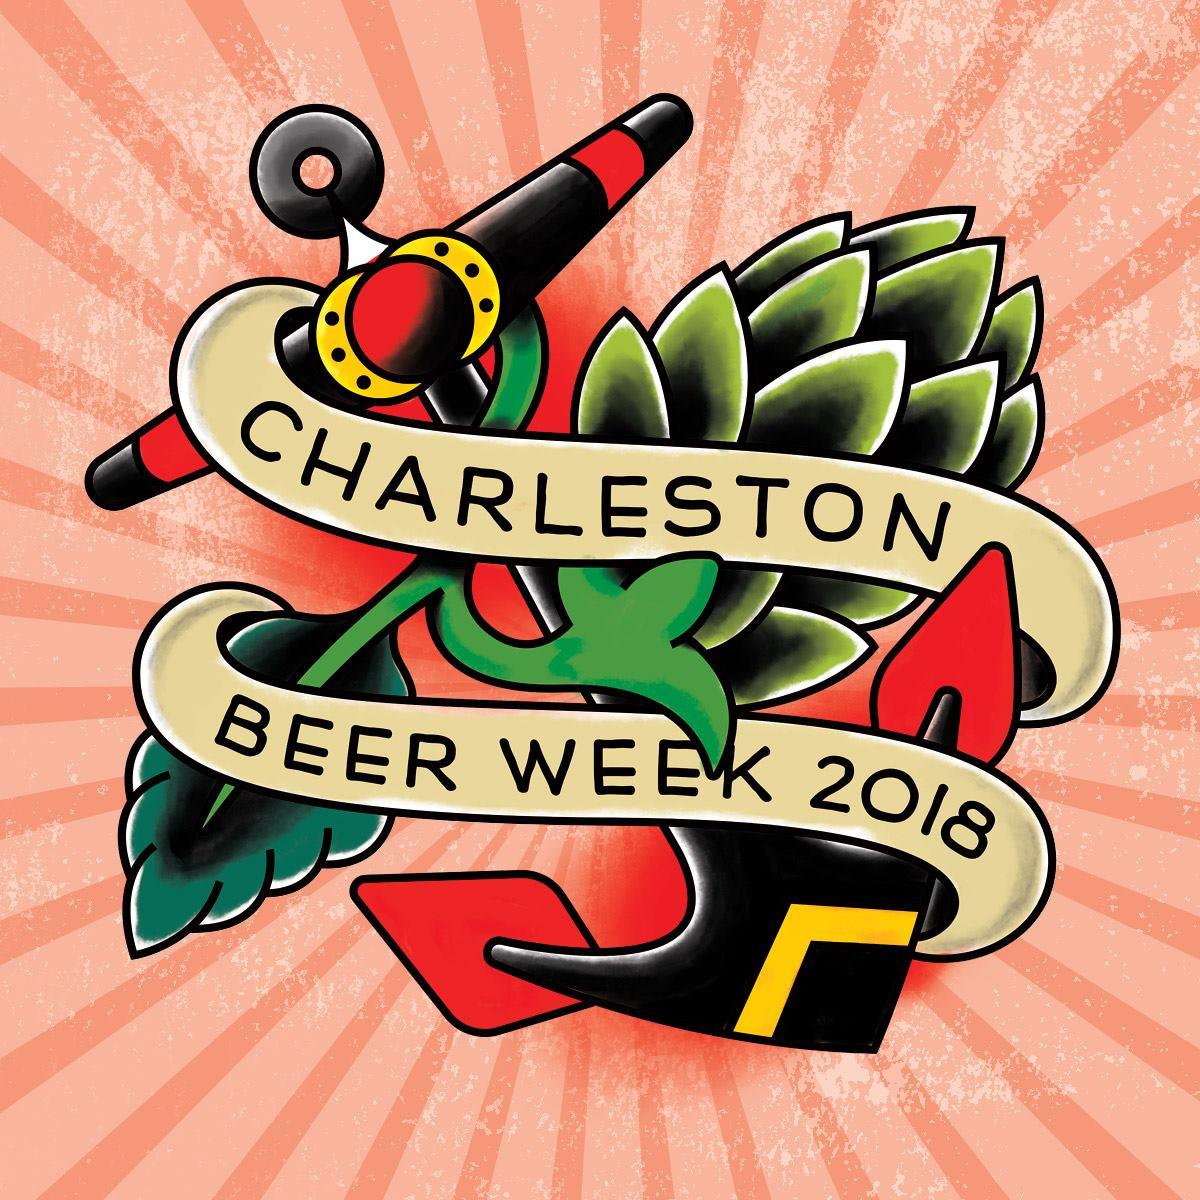 Charleston Beer Week Logo with Red Burst Background